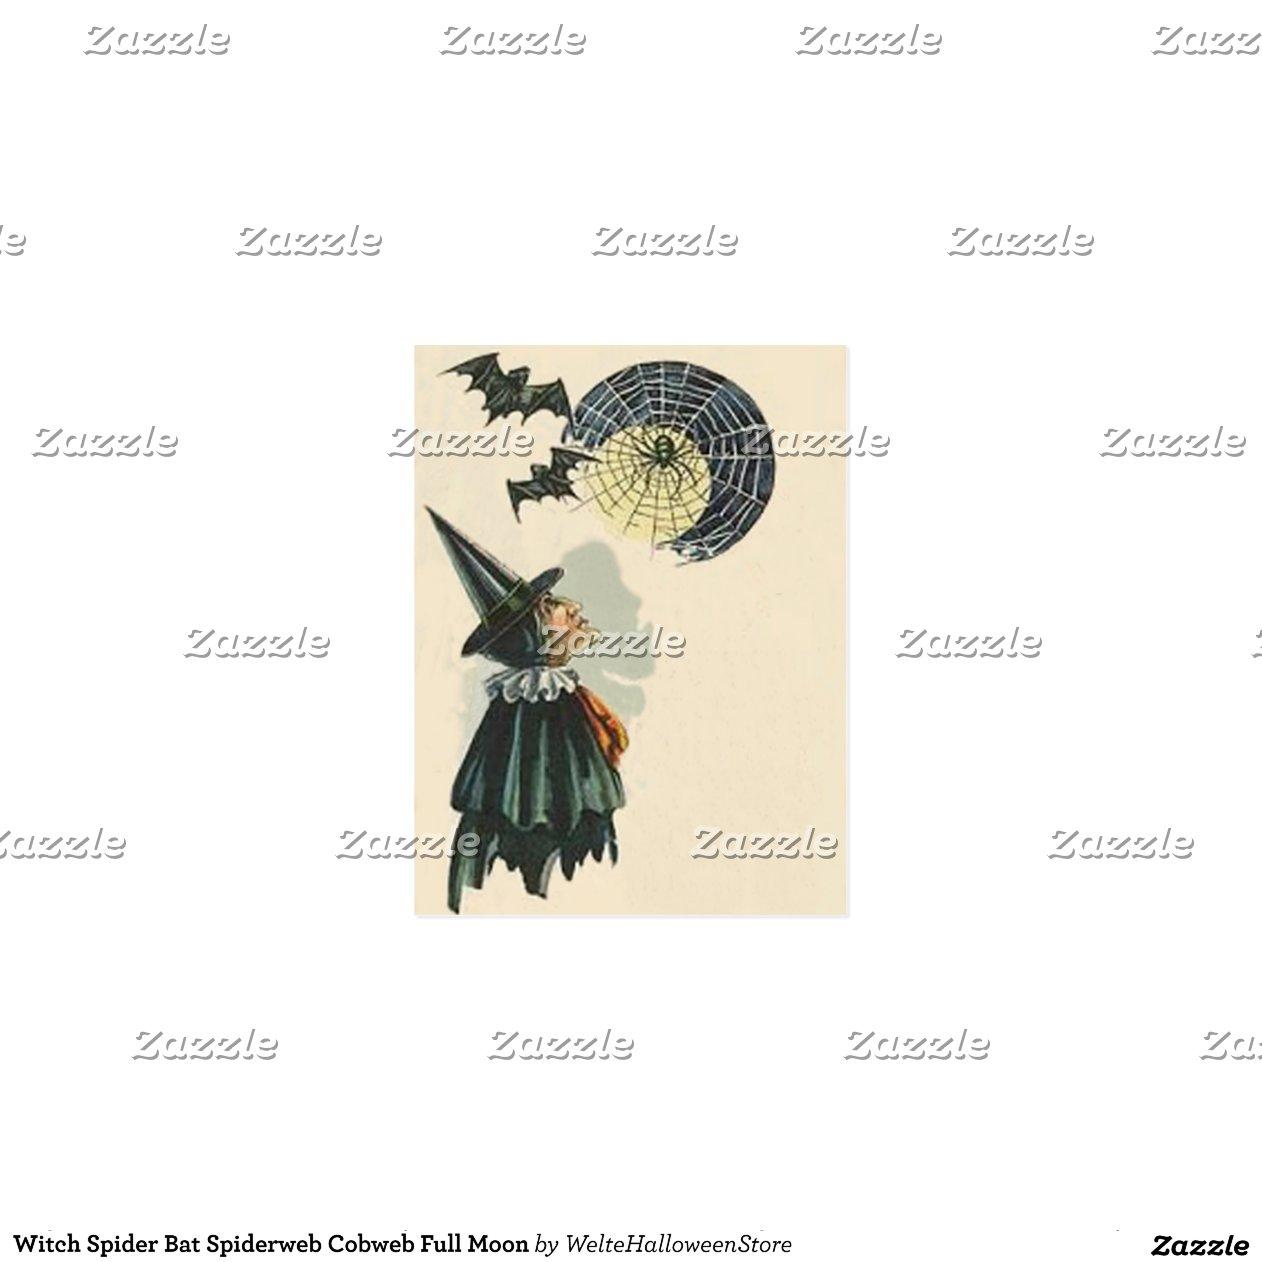 Witch Spider Bat Spiderweb Cobweb Full Moon Postcard   Zazzle